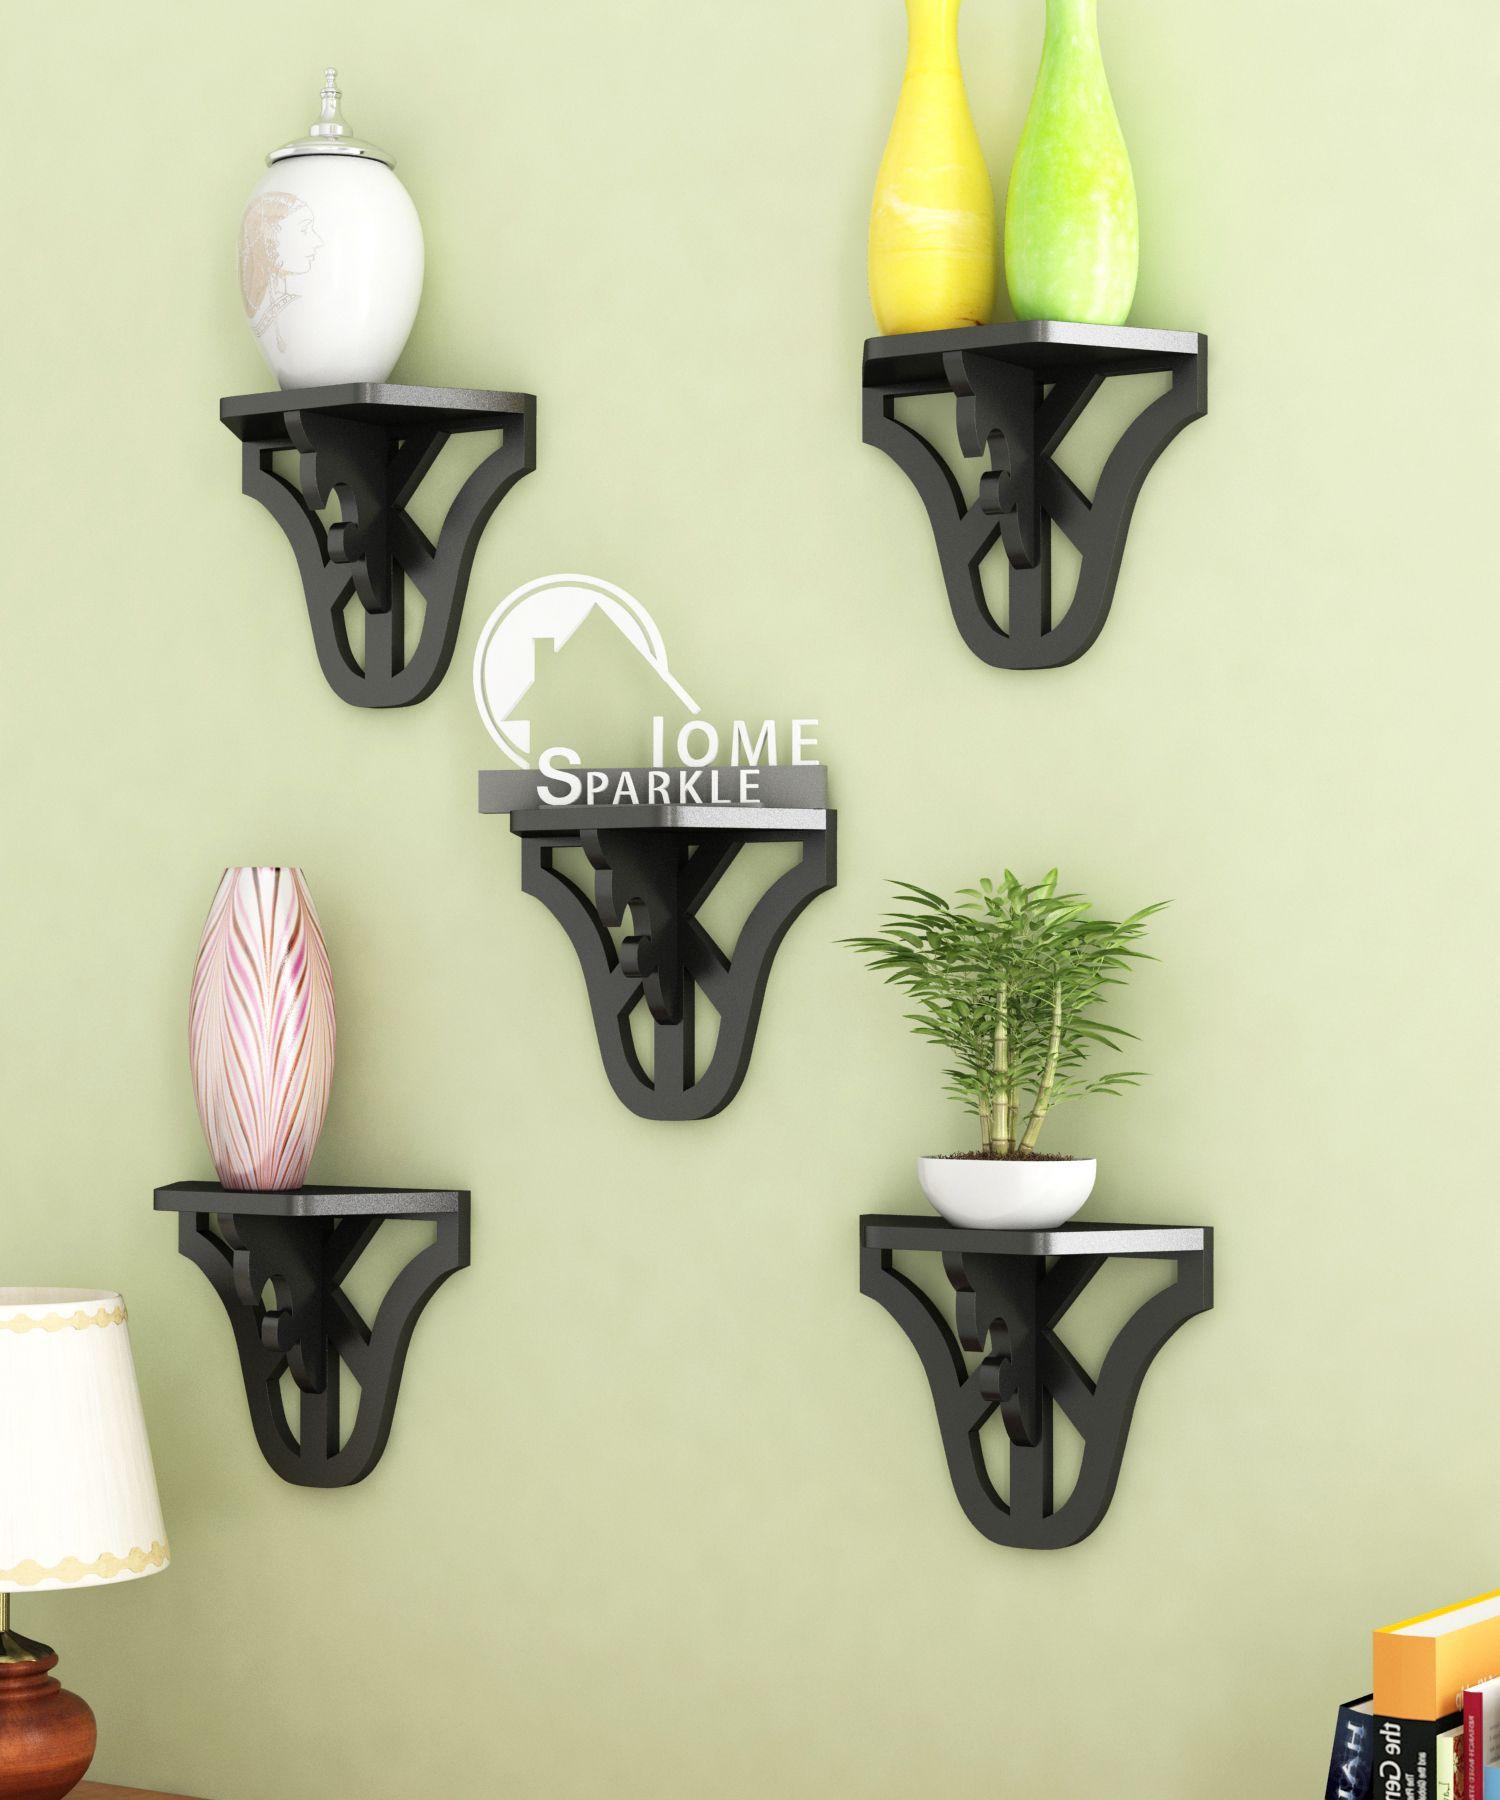 Home Sparkle MDF Set of 5 Carved Shelf For Wall Décor -Suitable For Living Room/Bed Room (Designed By Craftsman)